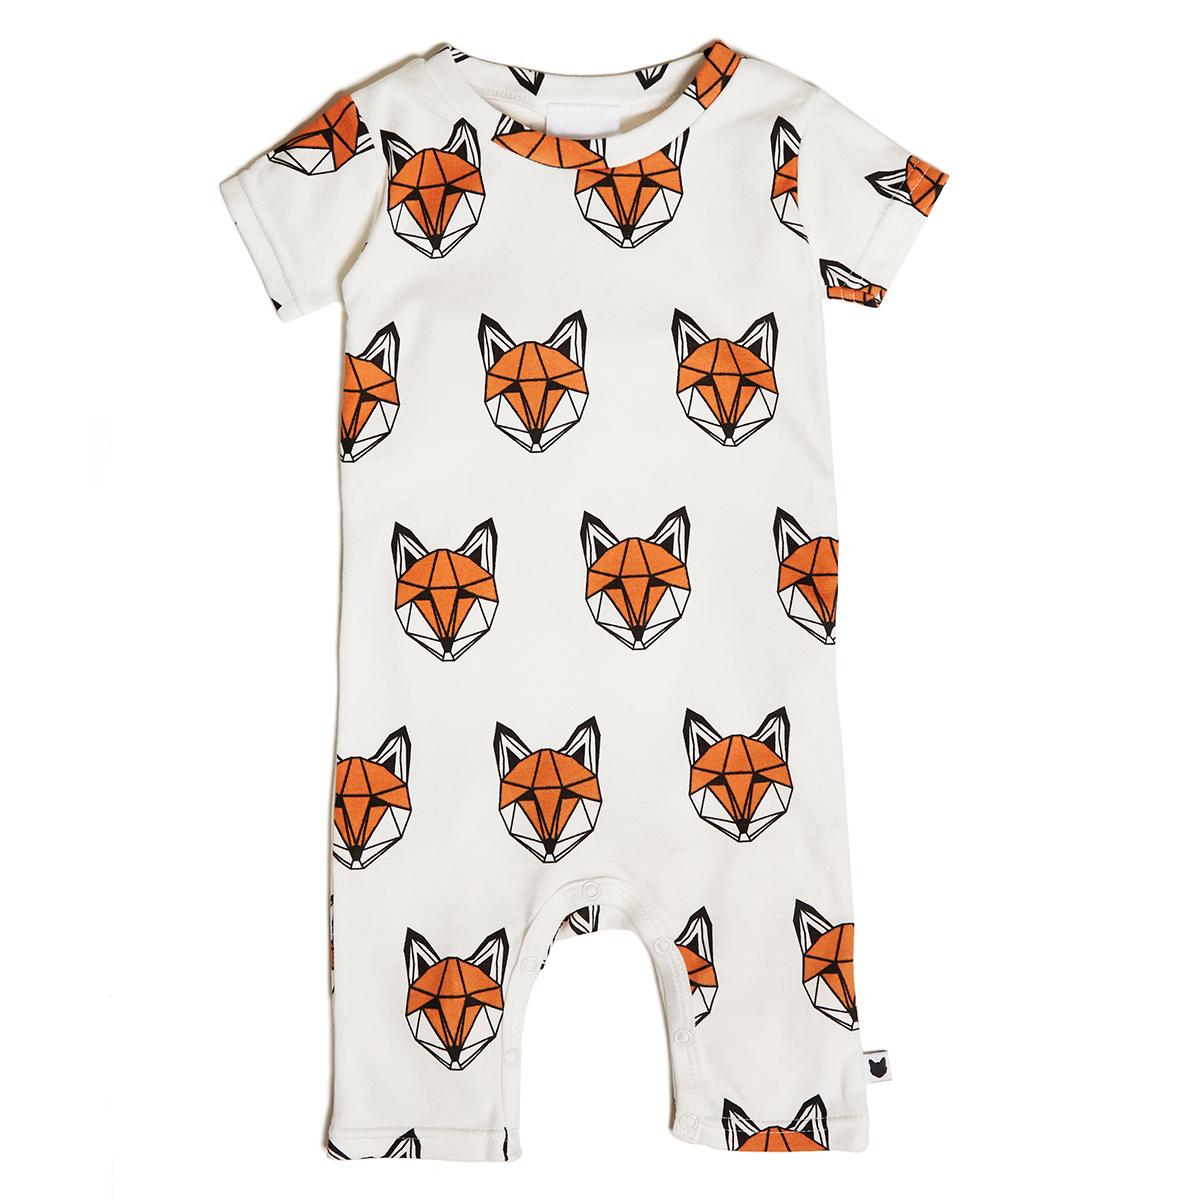 Robe & combinaison Combinaison Just Call Me Fox - 12/18 Mois Combinaison Just Call Me Fox - 12/18 Mois